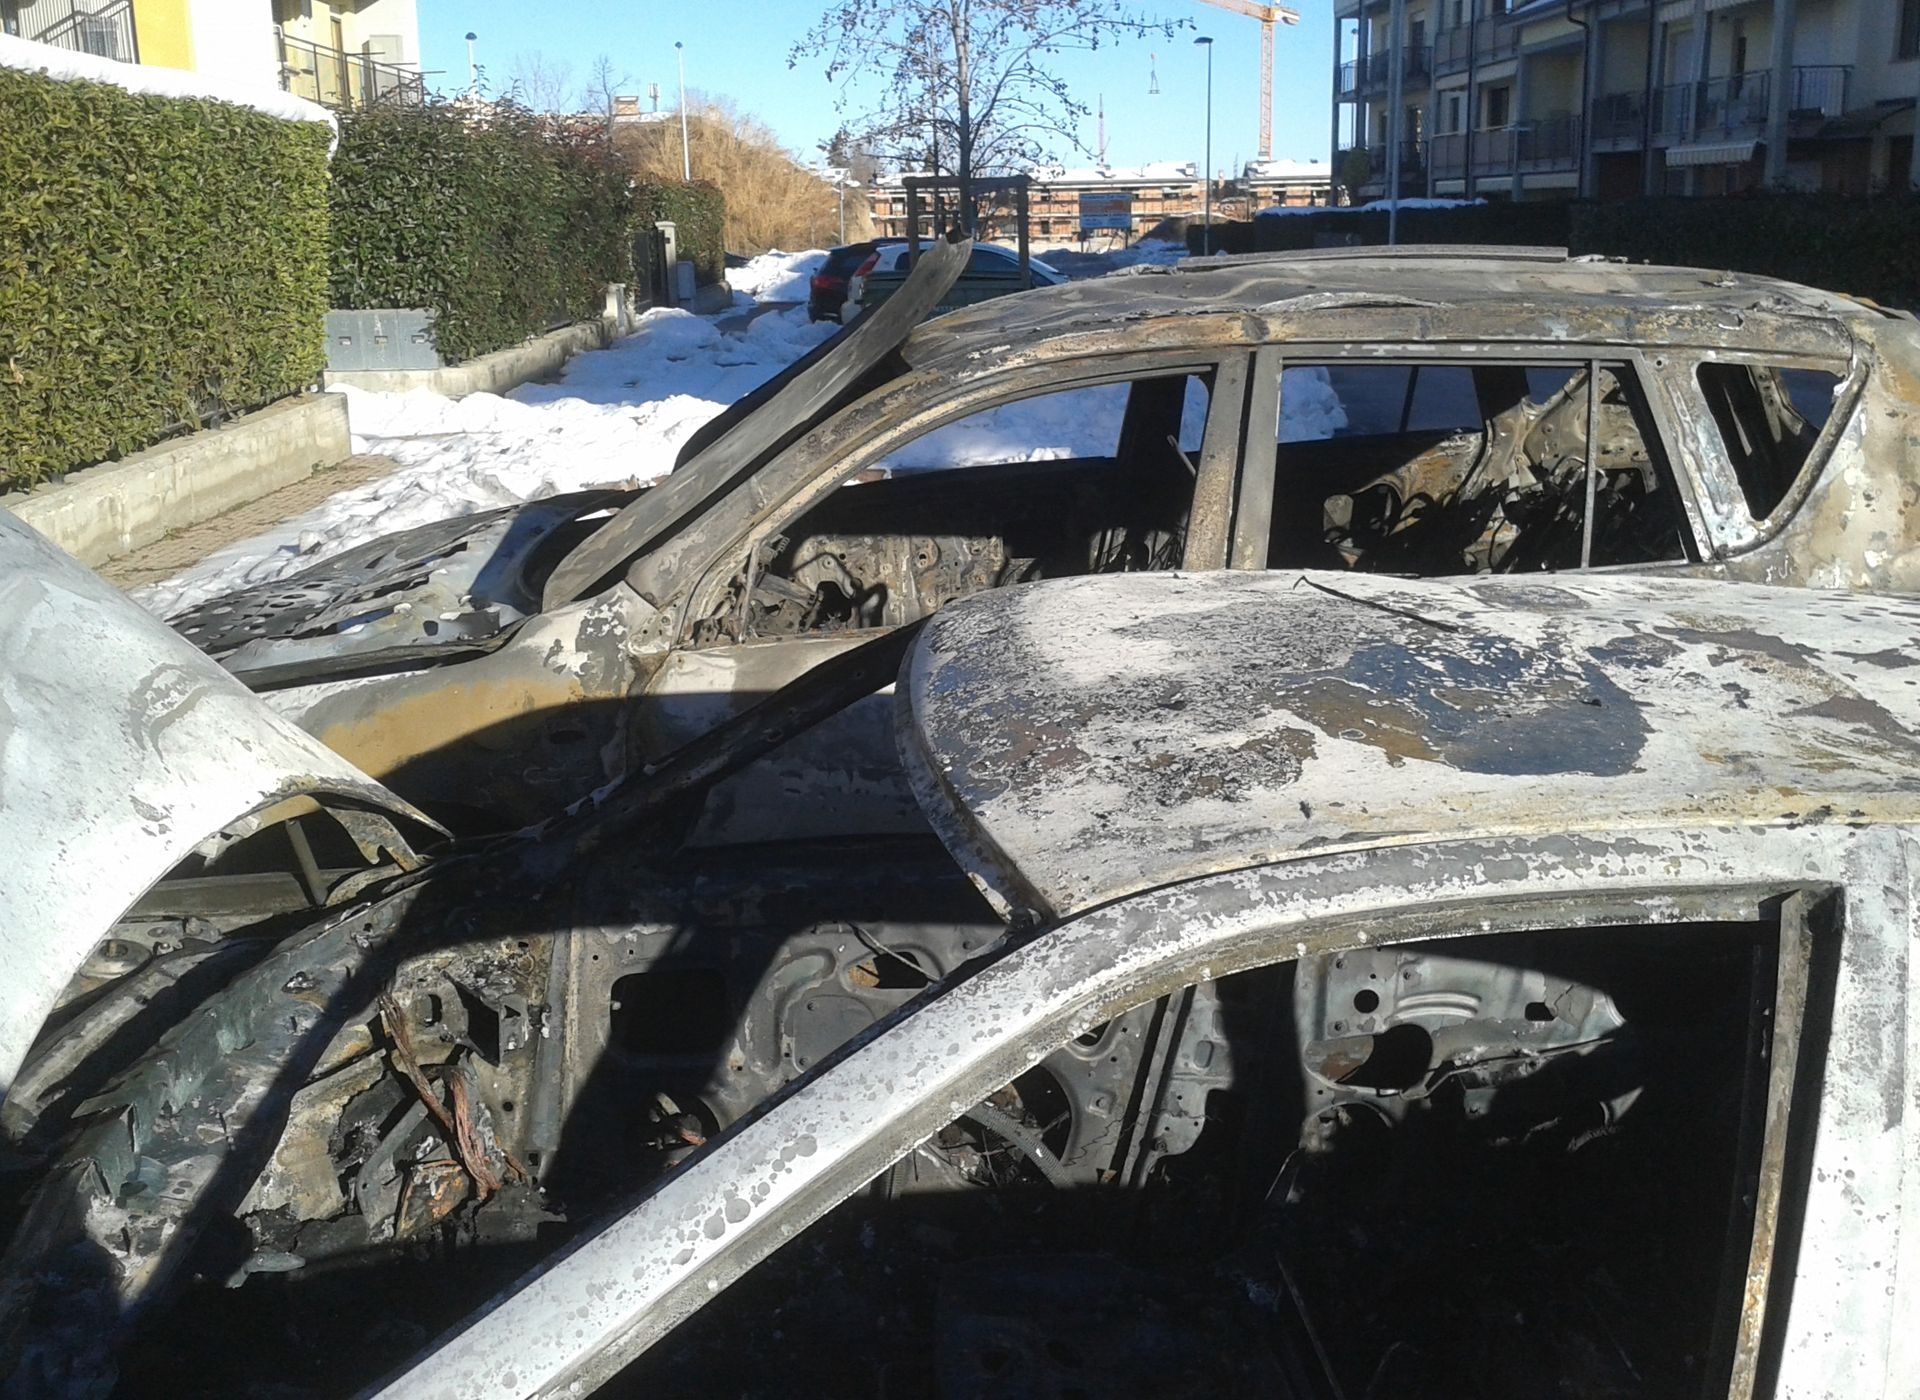 La Guida - Due auto incendiate a Borgo San Giuseppe